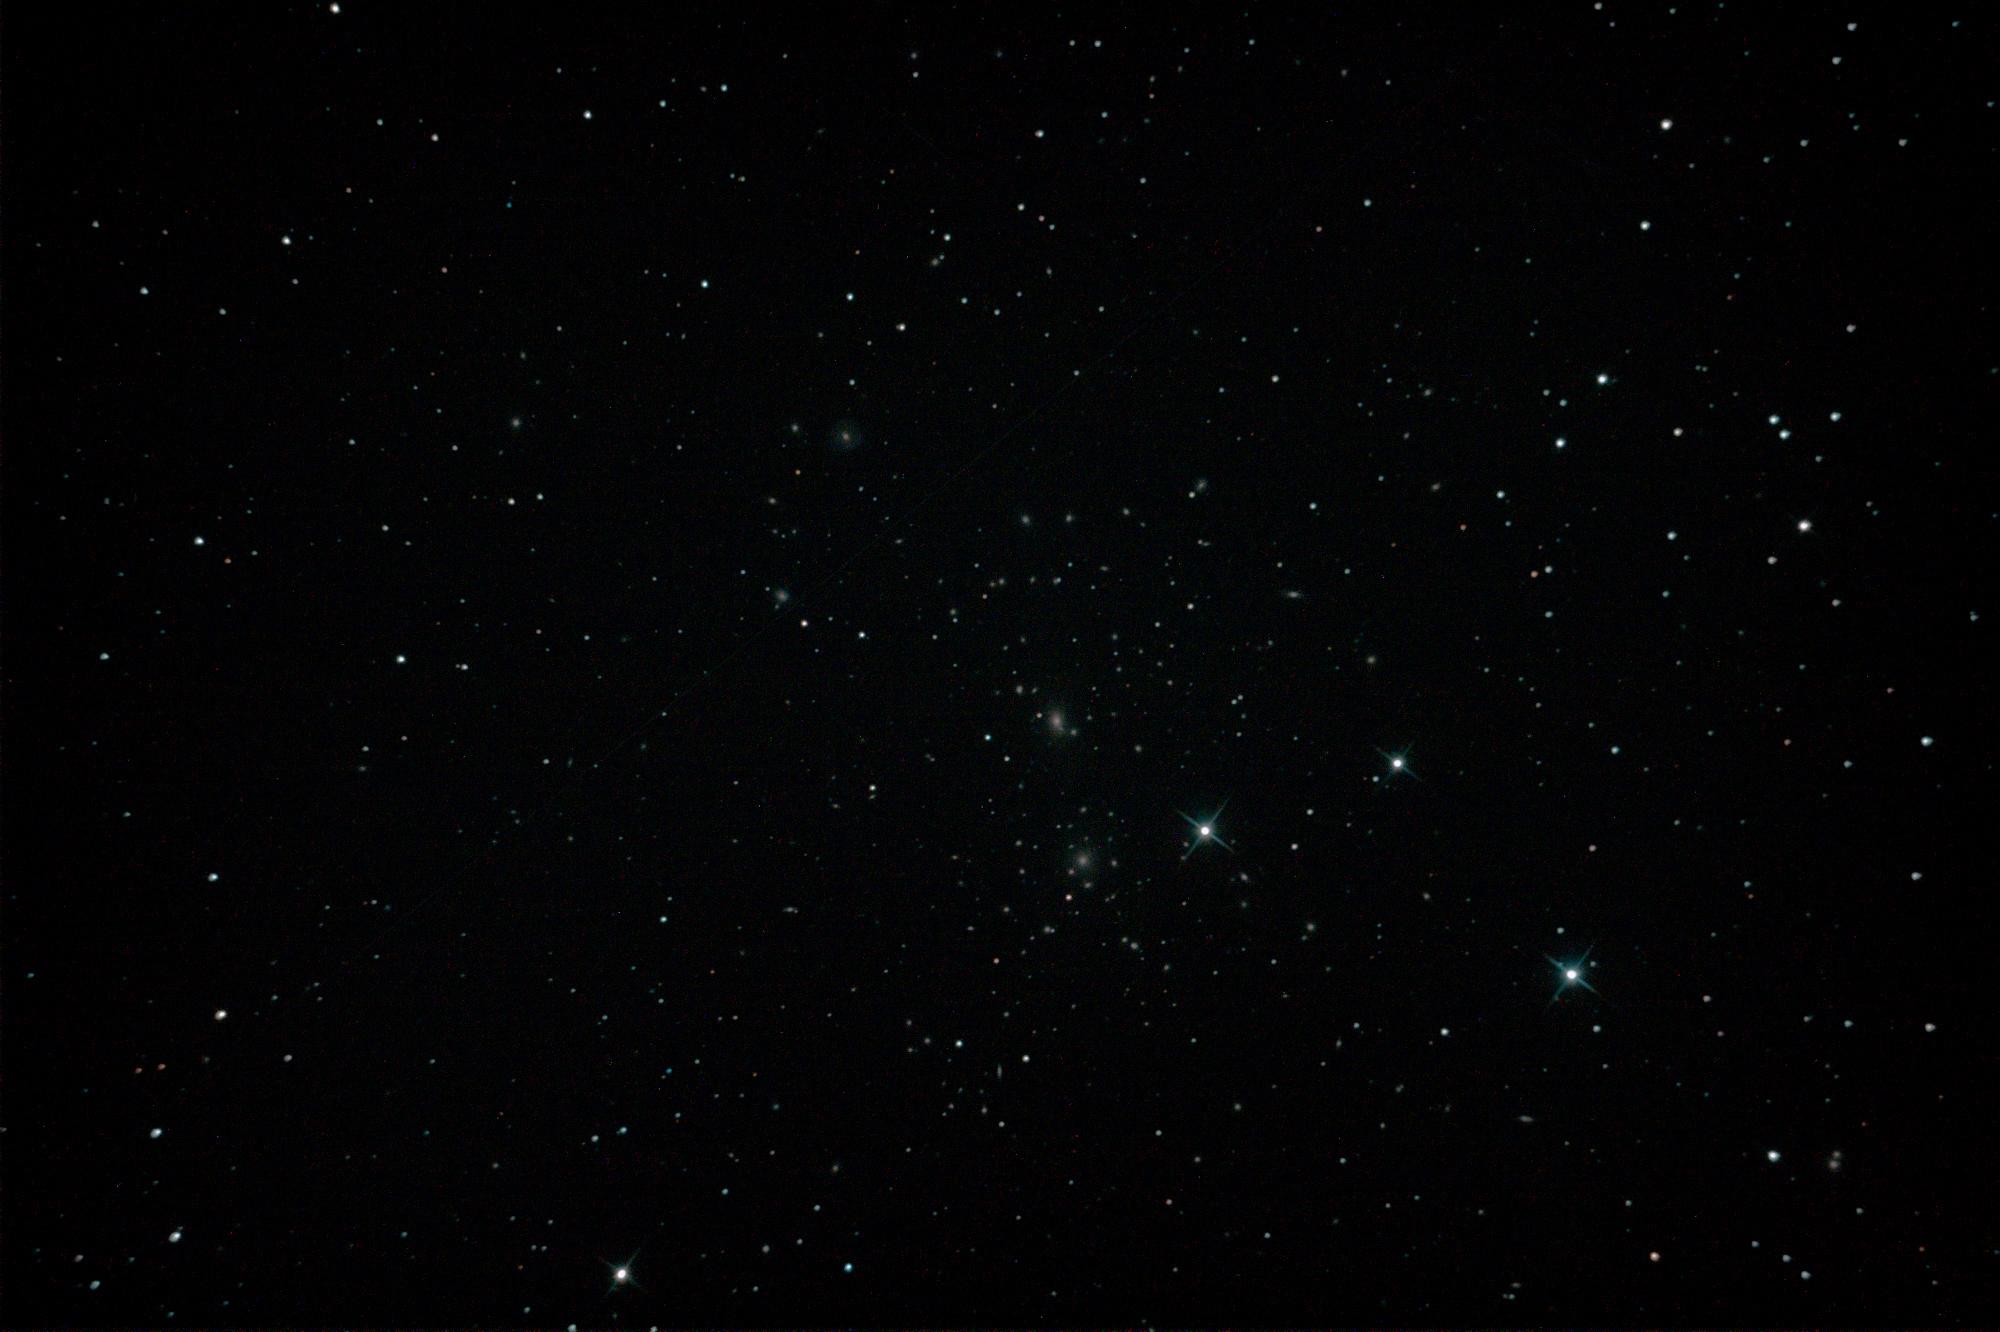 NGC4889 / Comahaufen